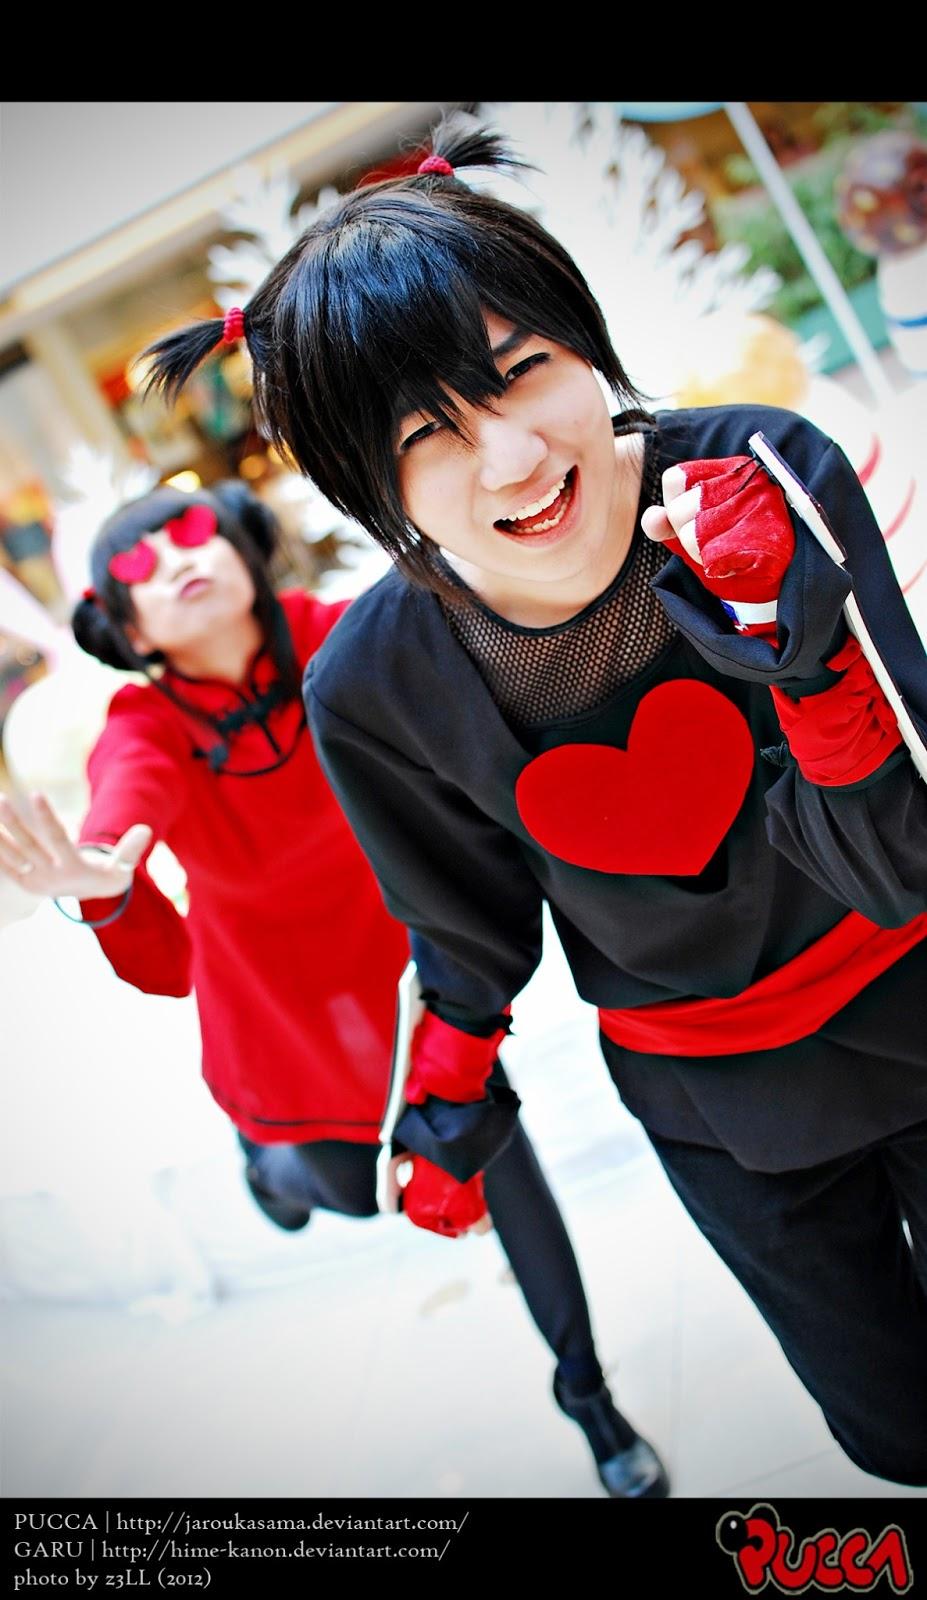 pucca and garu cosplay